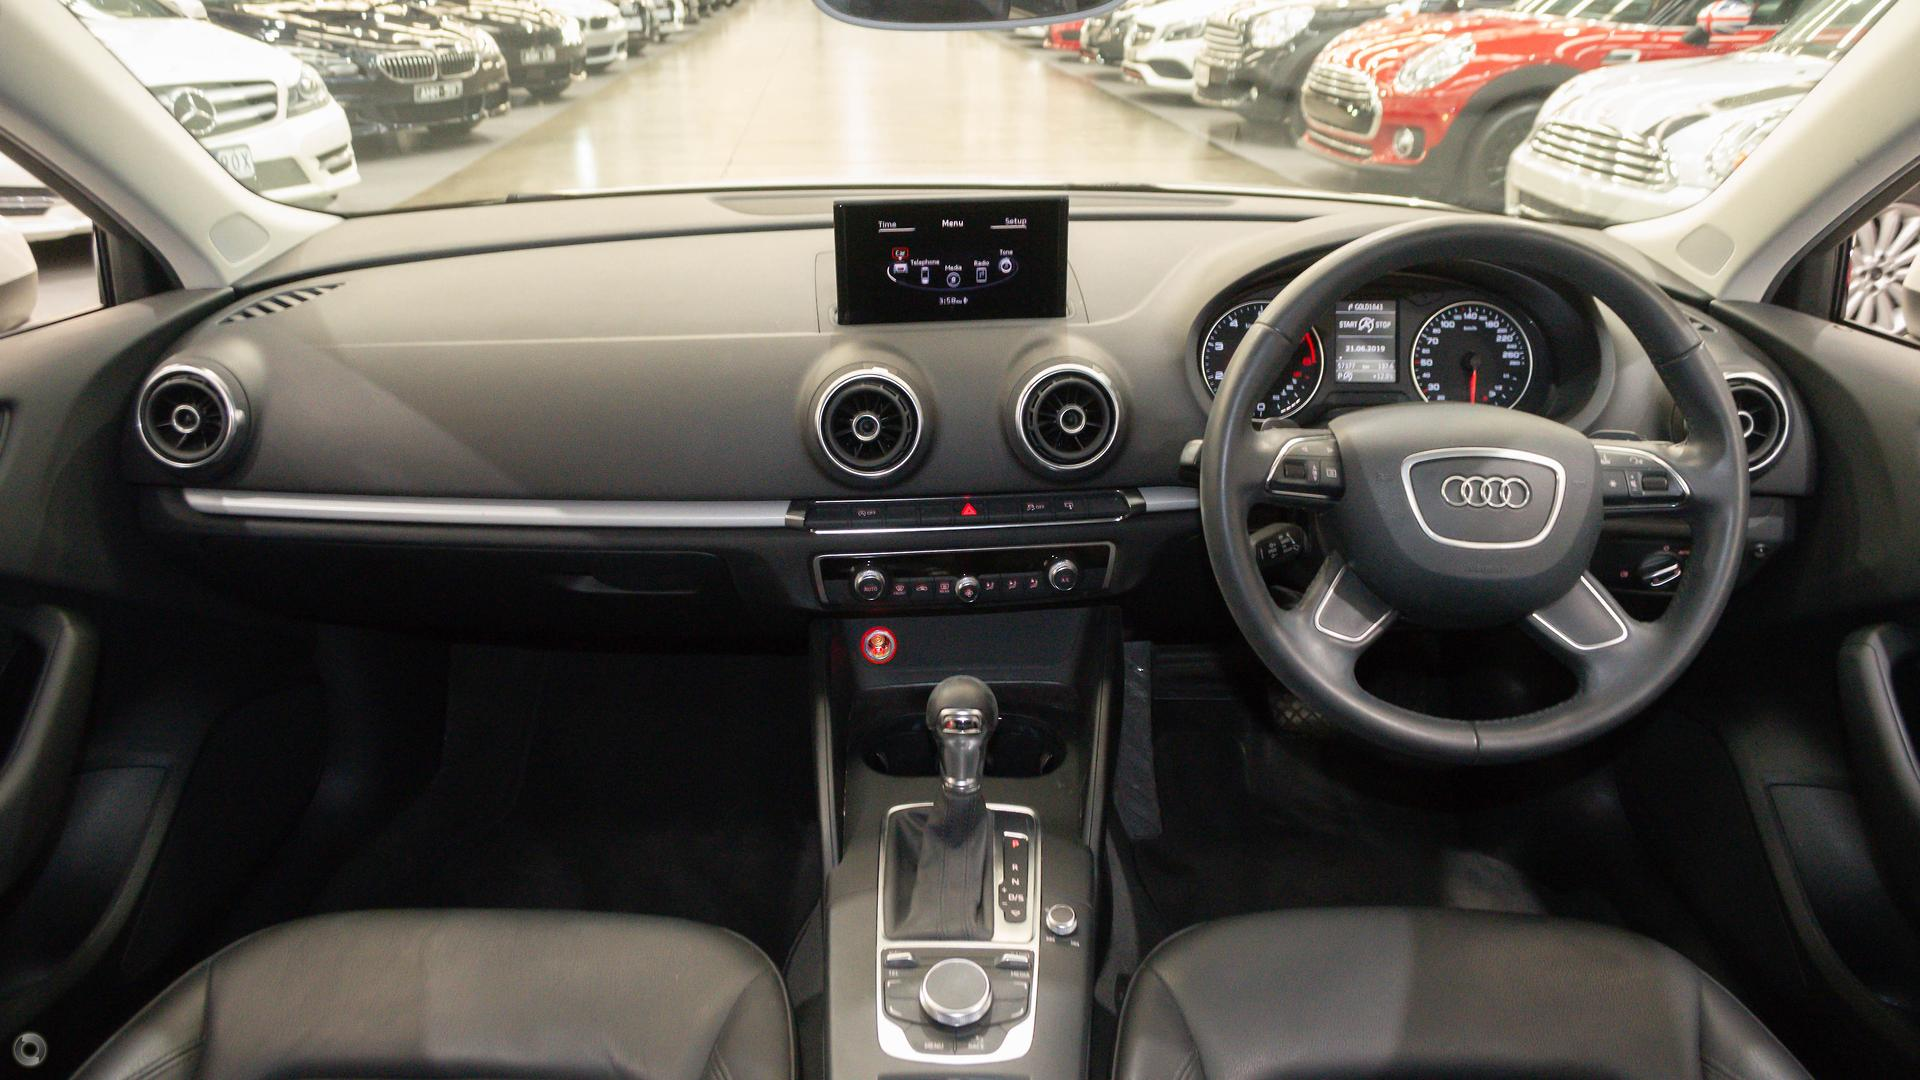 2013 Audi A3 Attraction 8P